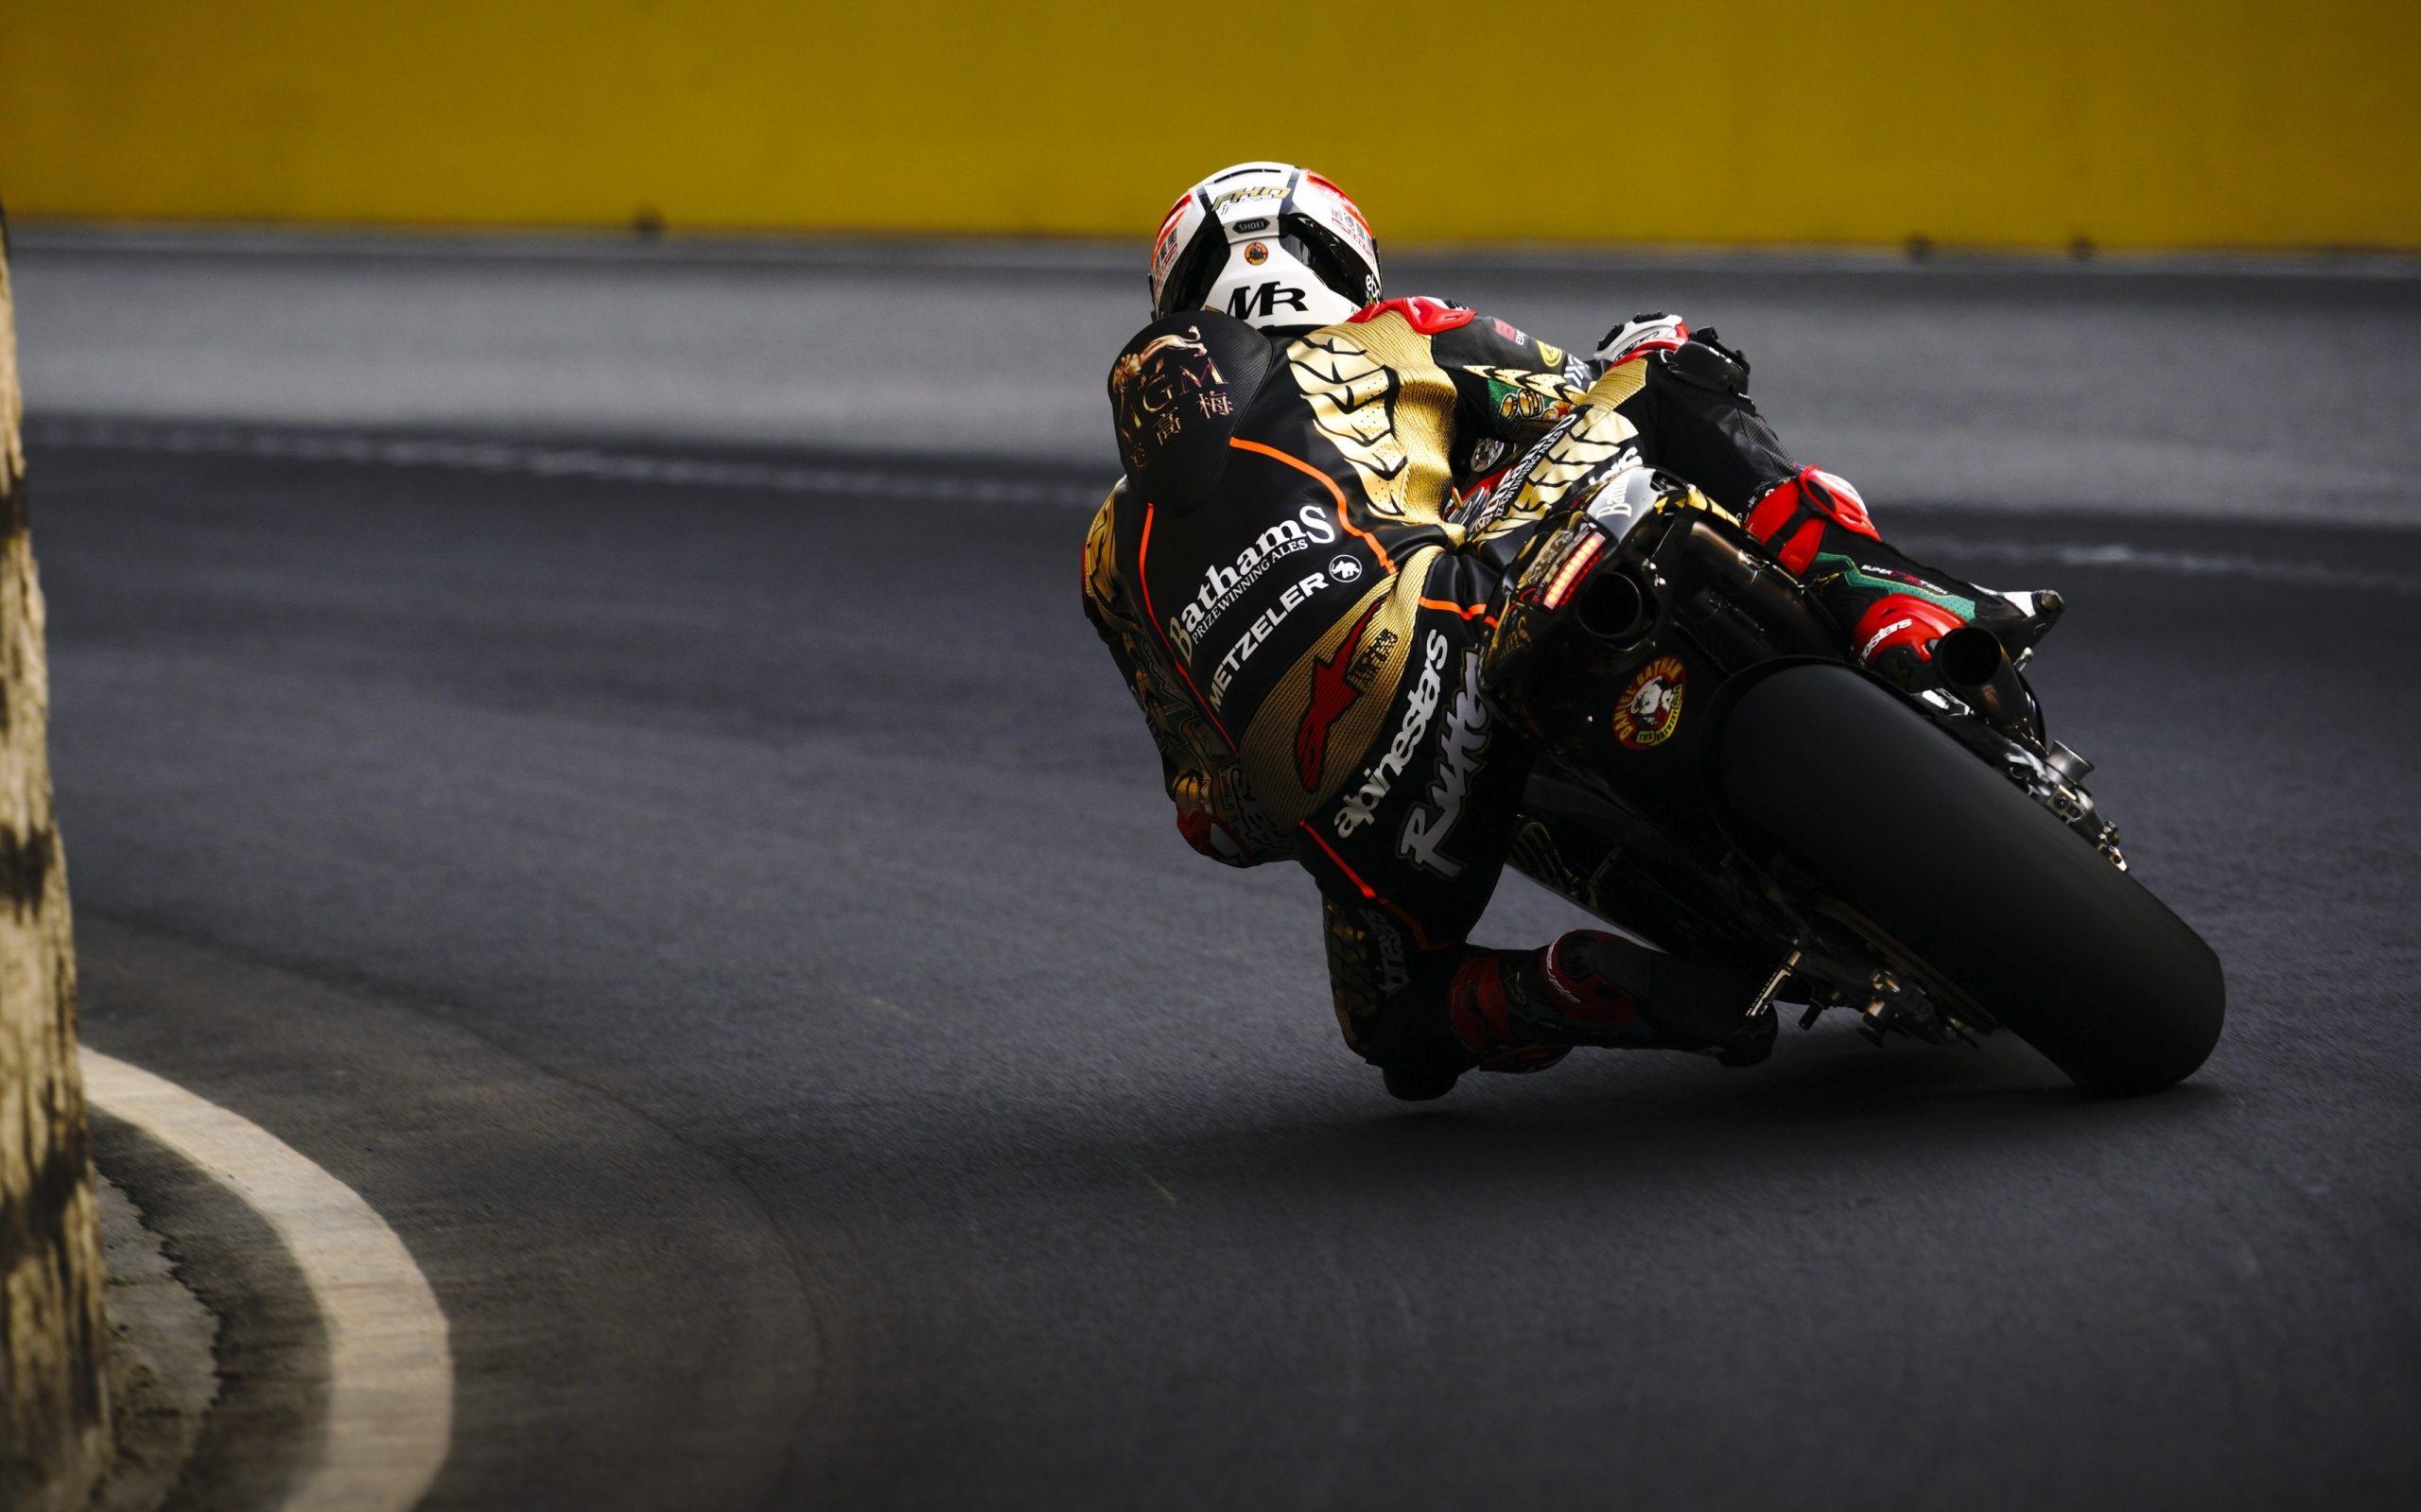 Michael Rutter taking on a bend at Macau GP